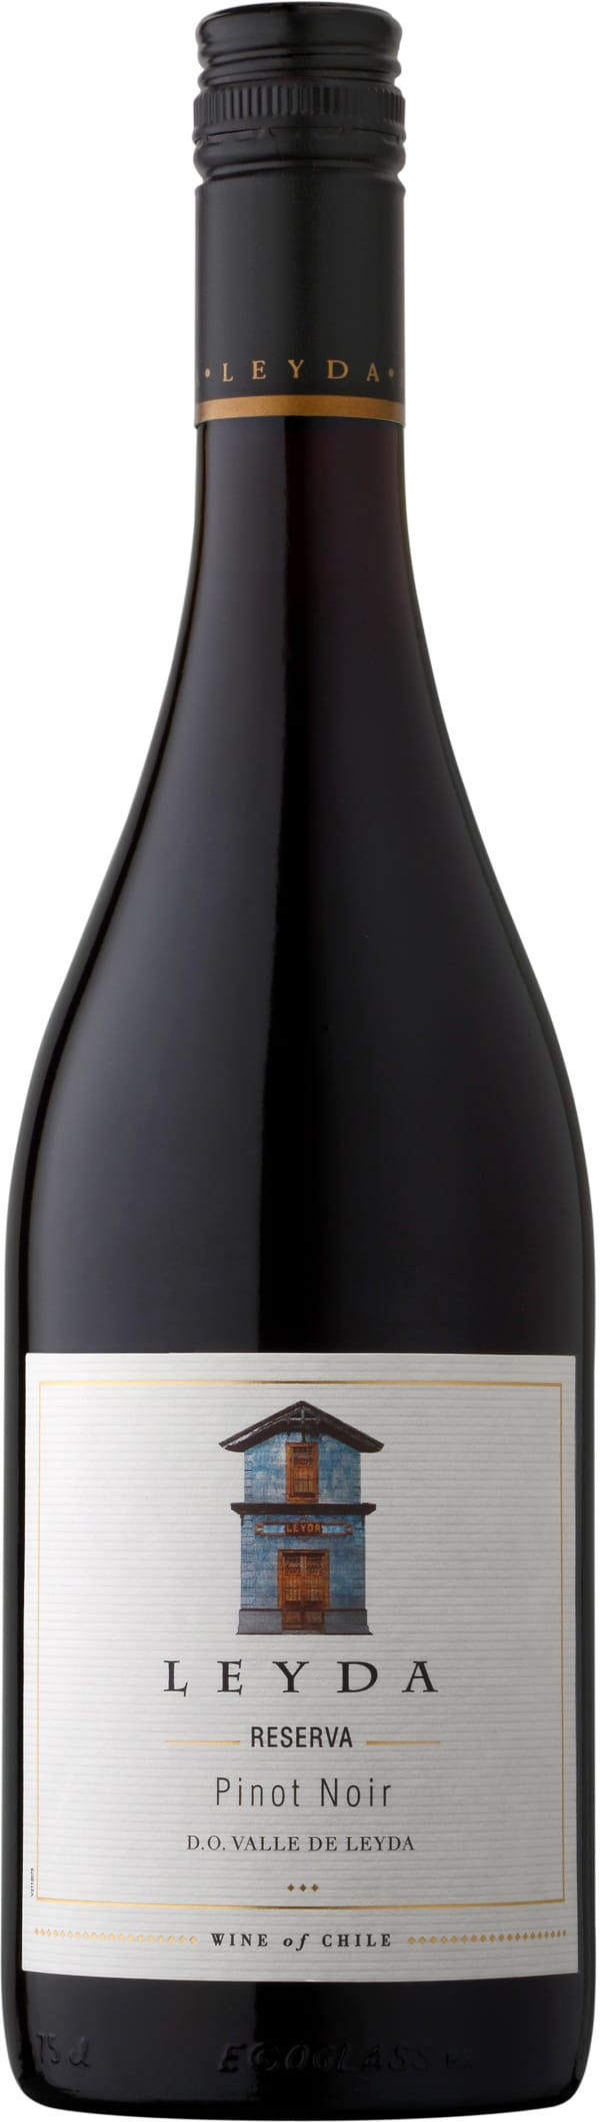 Leyda Reserva Pinot Noir 2018